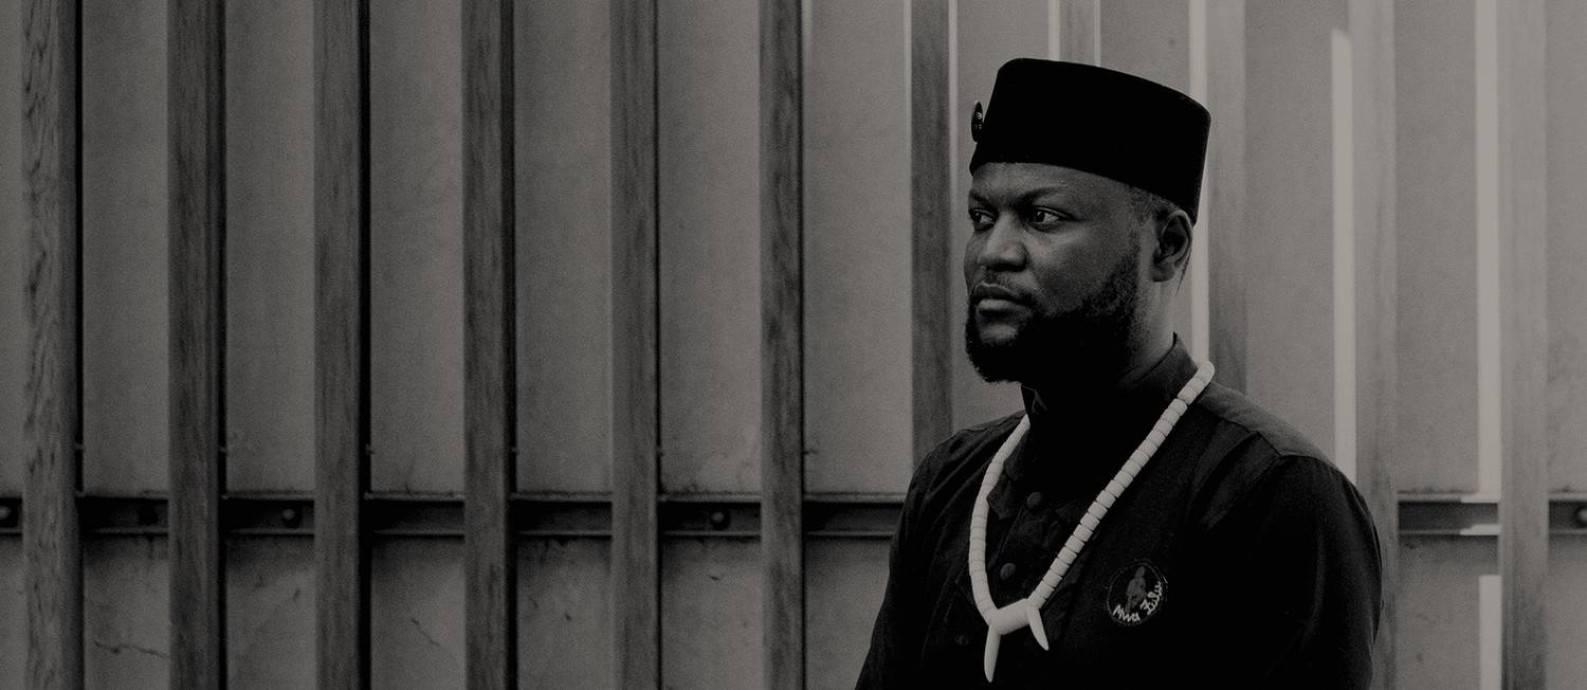 Ativista congolês Mwazulu Diyabanza, em Paris Foto: ELLIOTT VERDIER / NYT